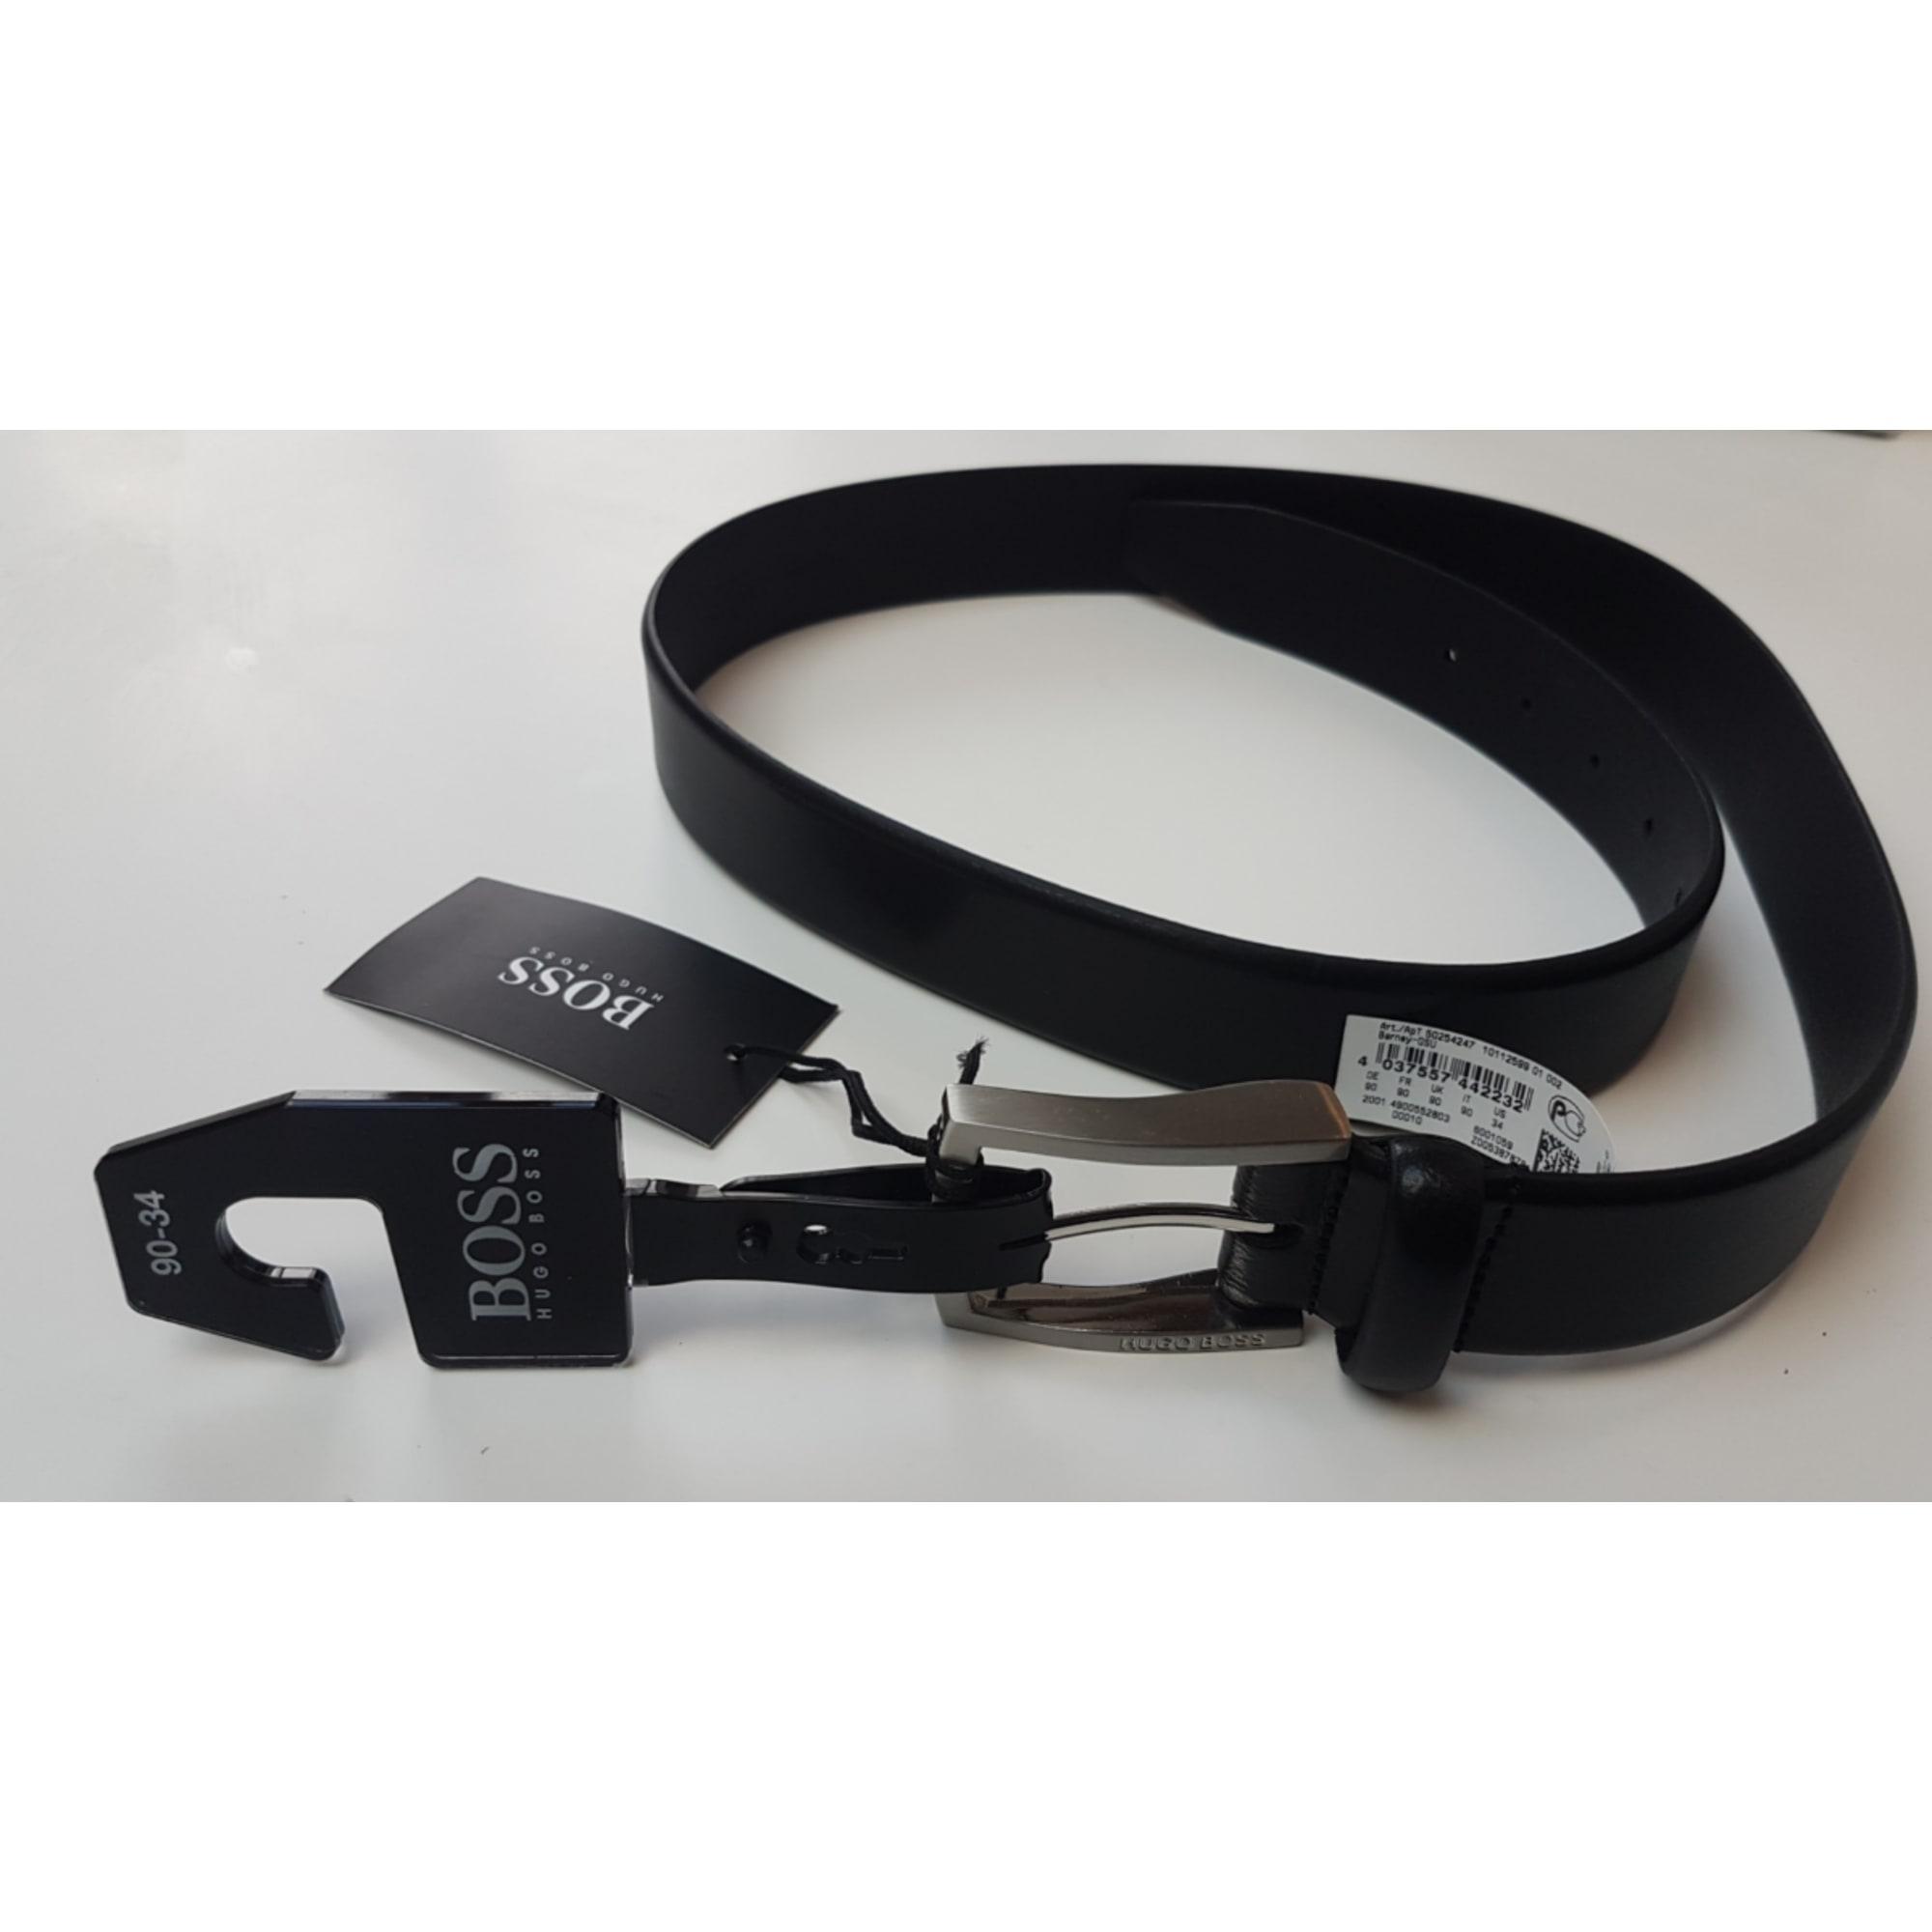 b4736512670 Ceinture HUGO BOSS 90 noir vendu par Dimytrios - 7931829